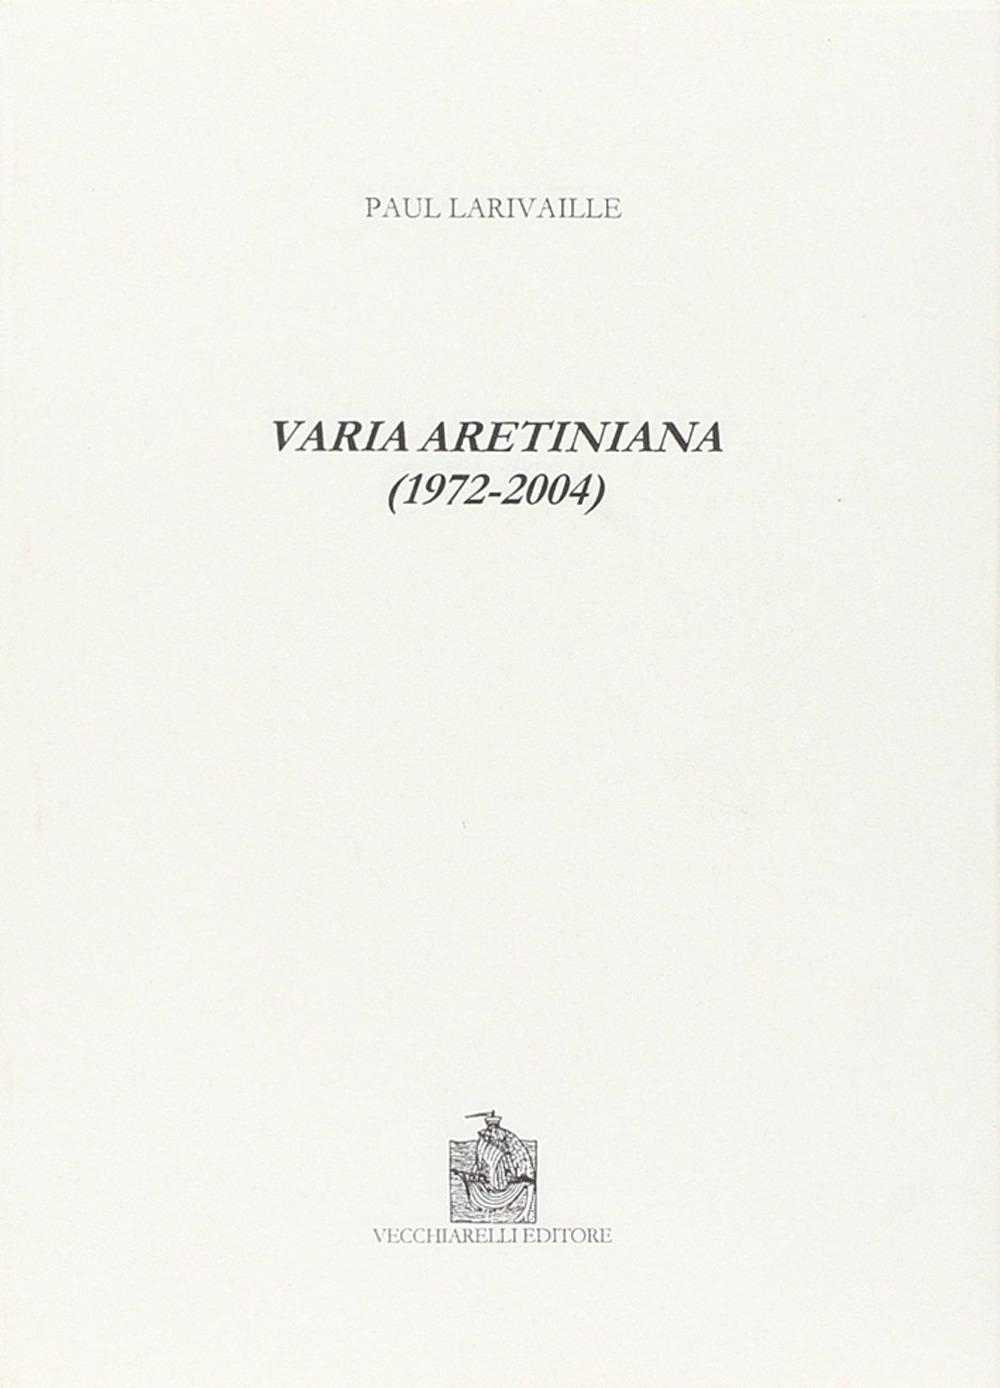 Varia aretiniana (1972-2004)